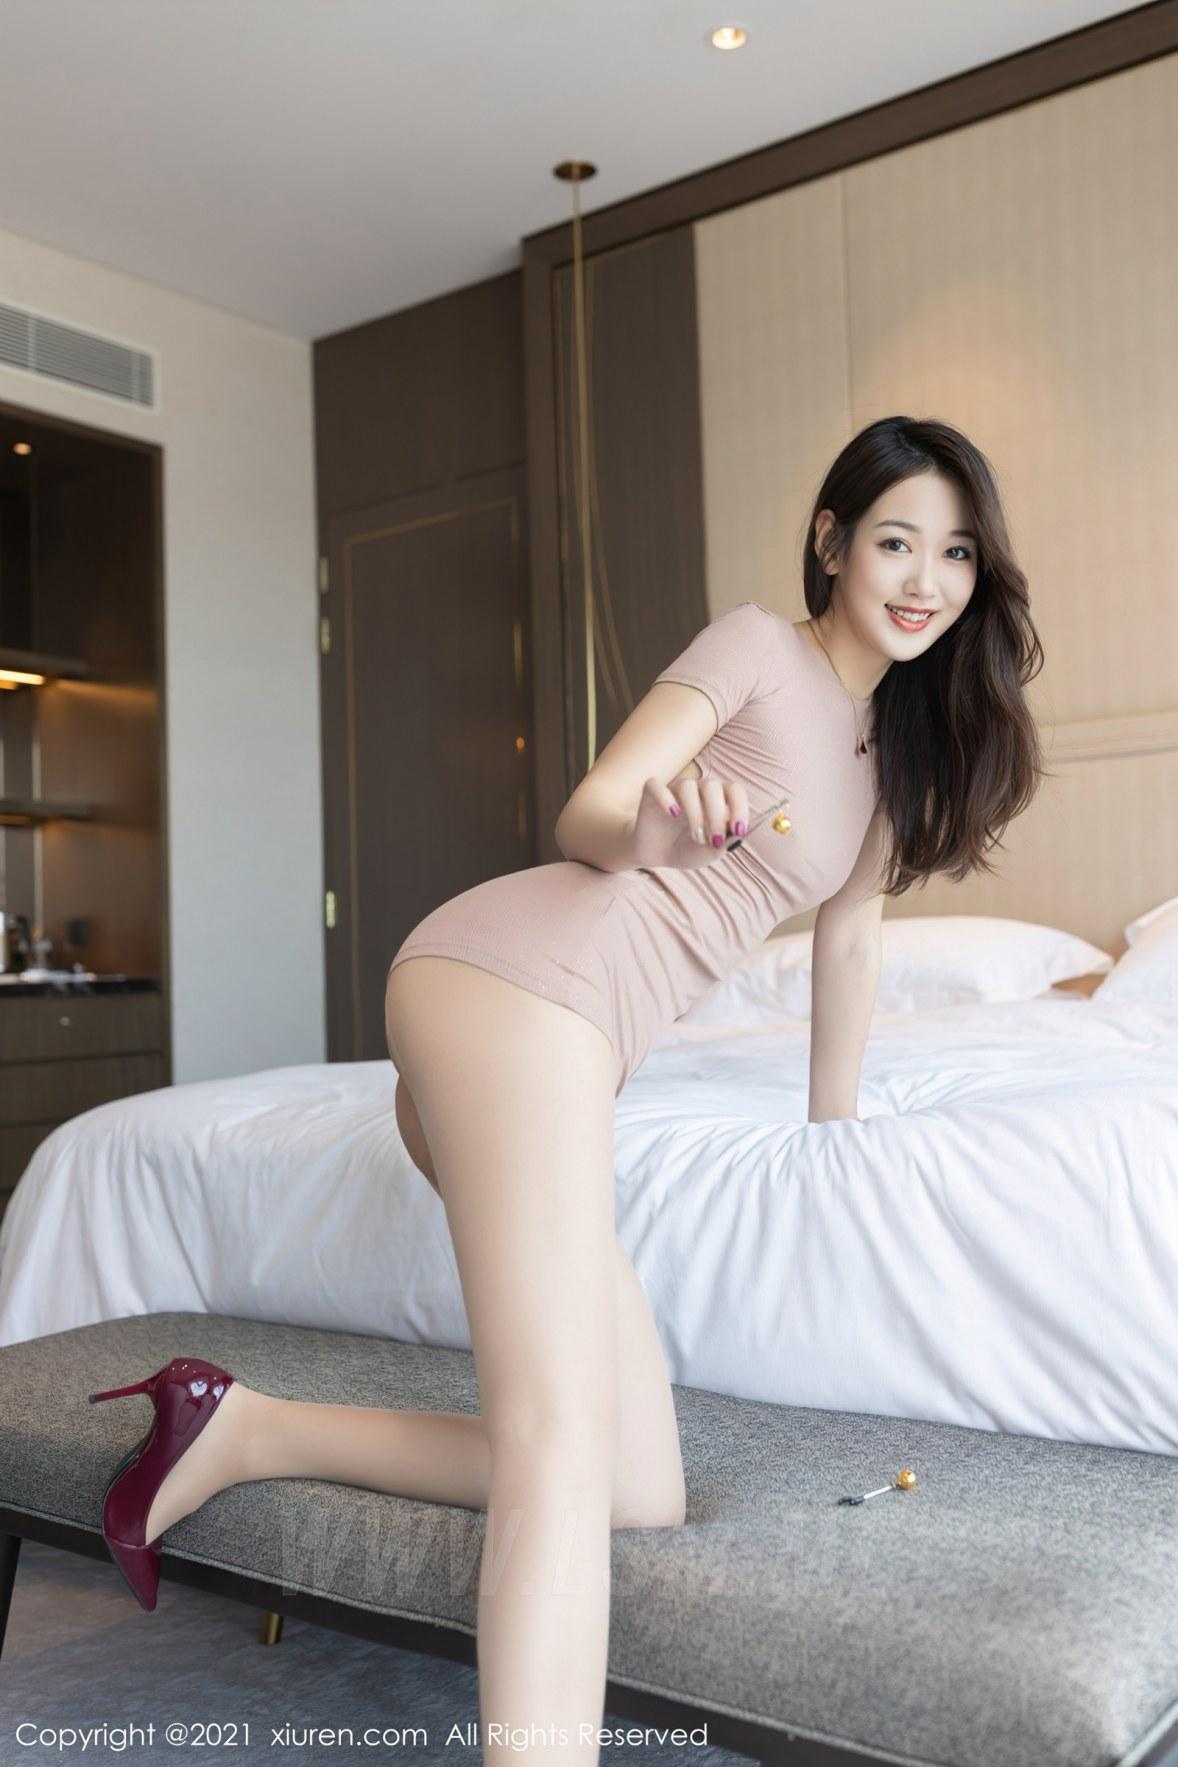 3780 037 3em 3600 5400 - XiuRen 秀人 No.3780 裸色裙主题系列 唐安琪 澳门旅拍写真22 - 秀人网 -【免费在线写真】【丽人丝语】